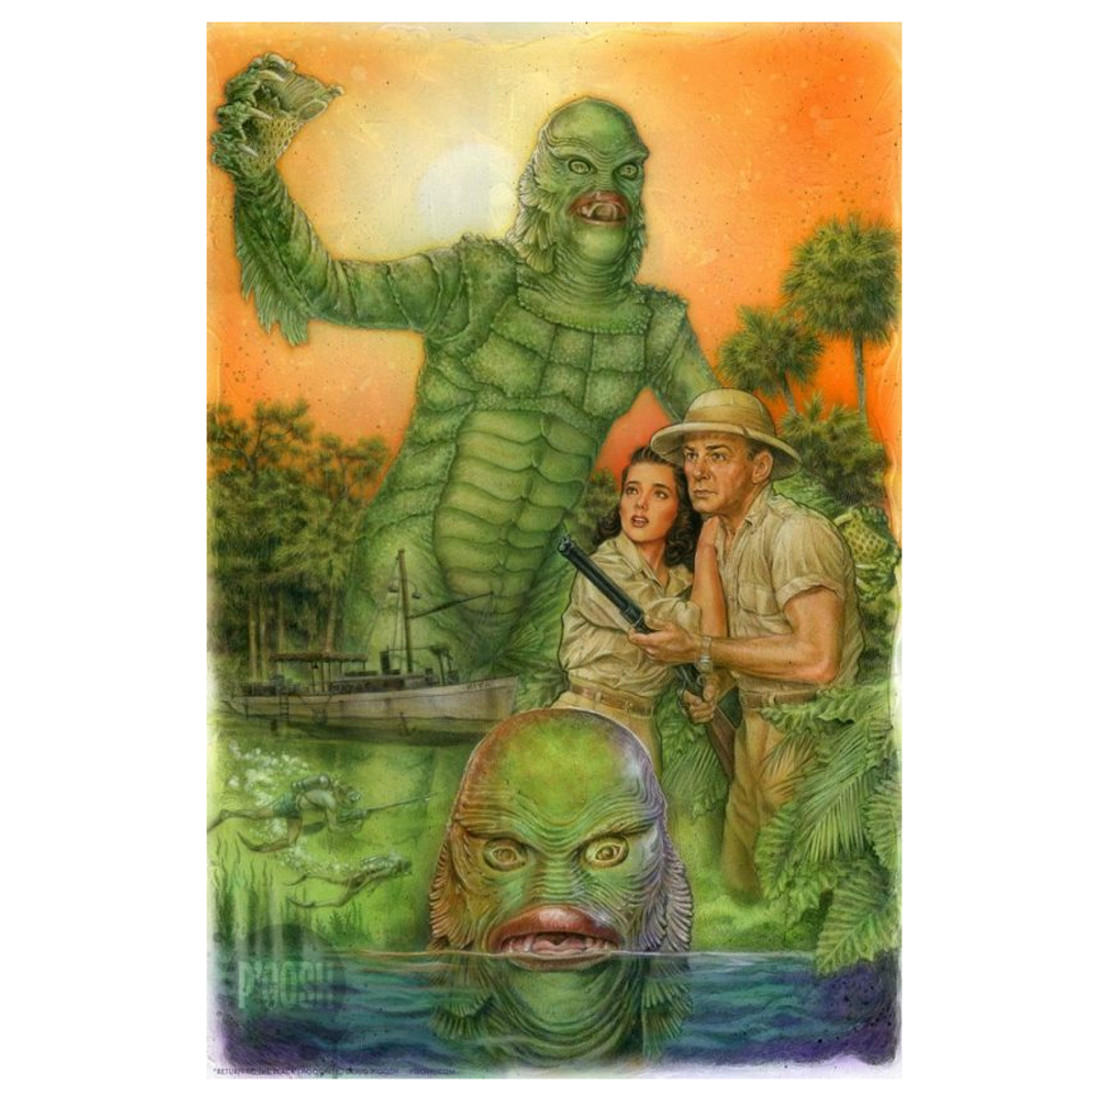 P'gosh Return To The Black Lagoon Art Print